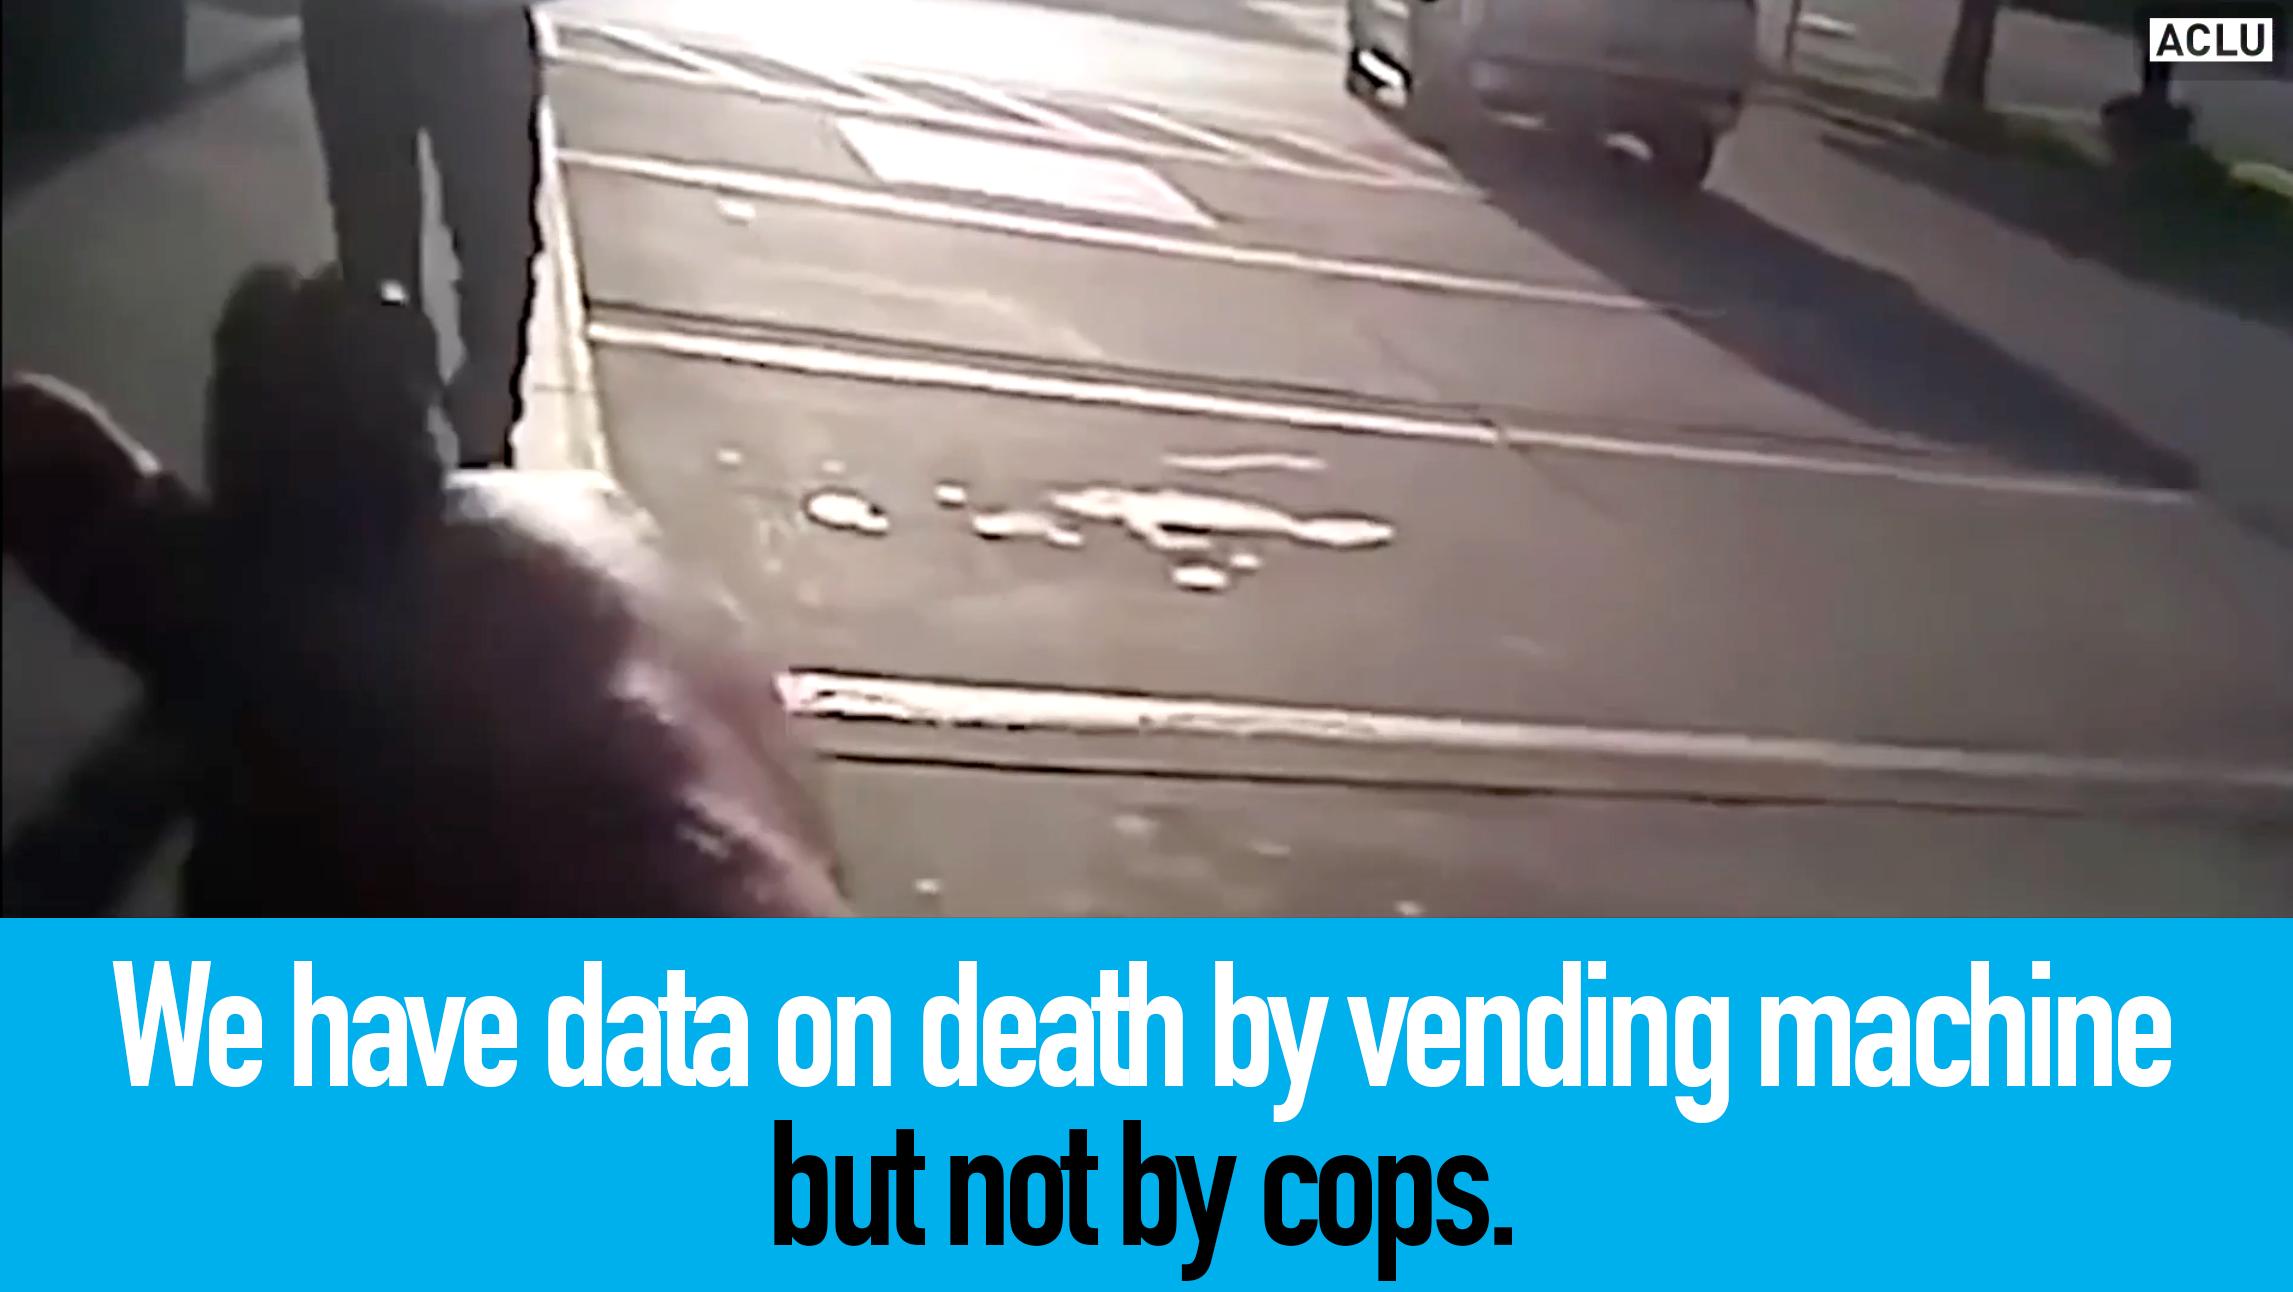 killed by vending machine